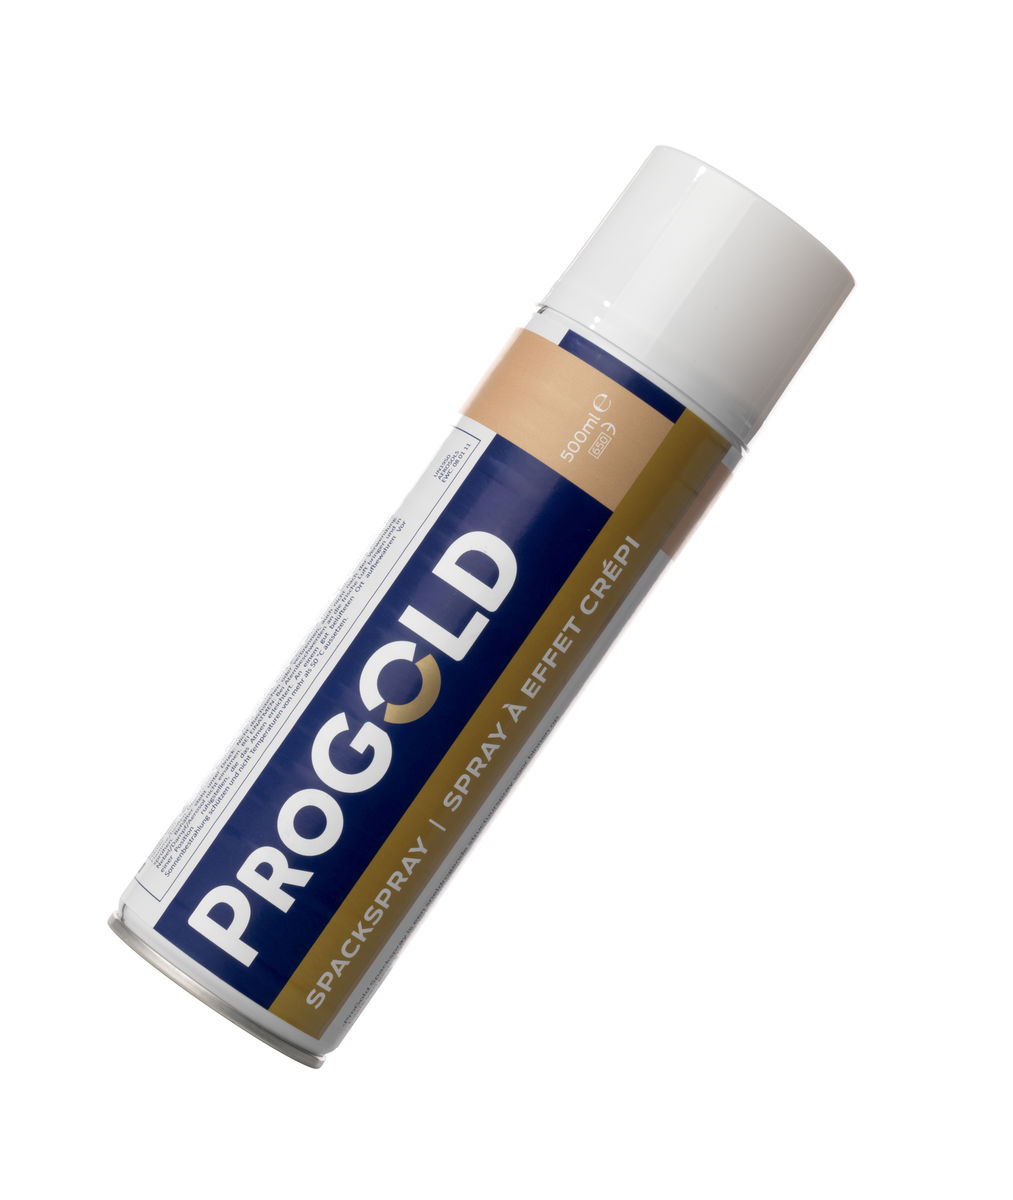 ProGold Spackspray